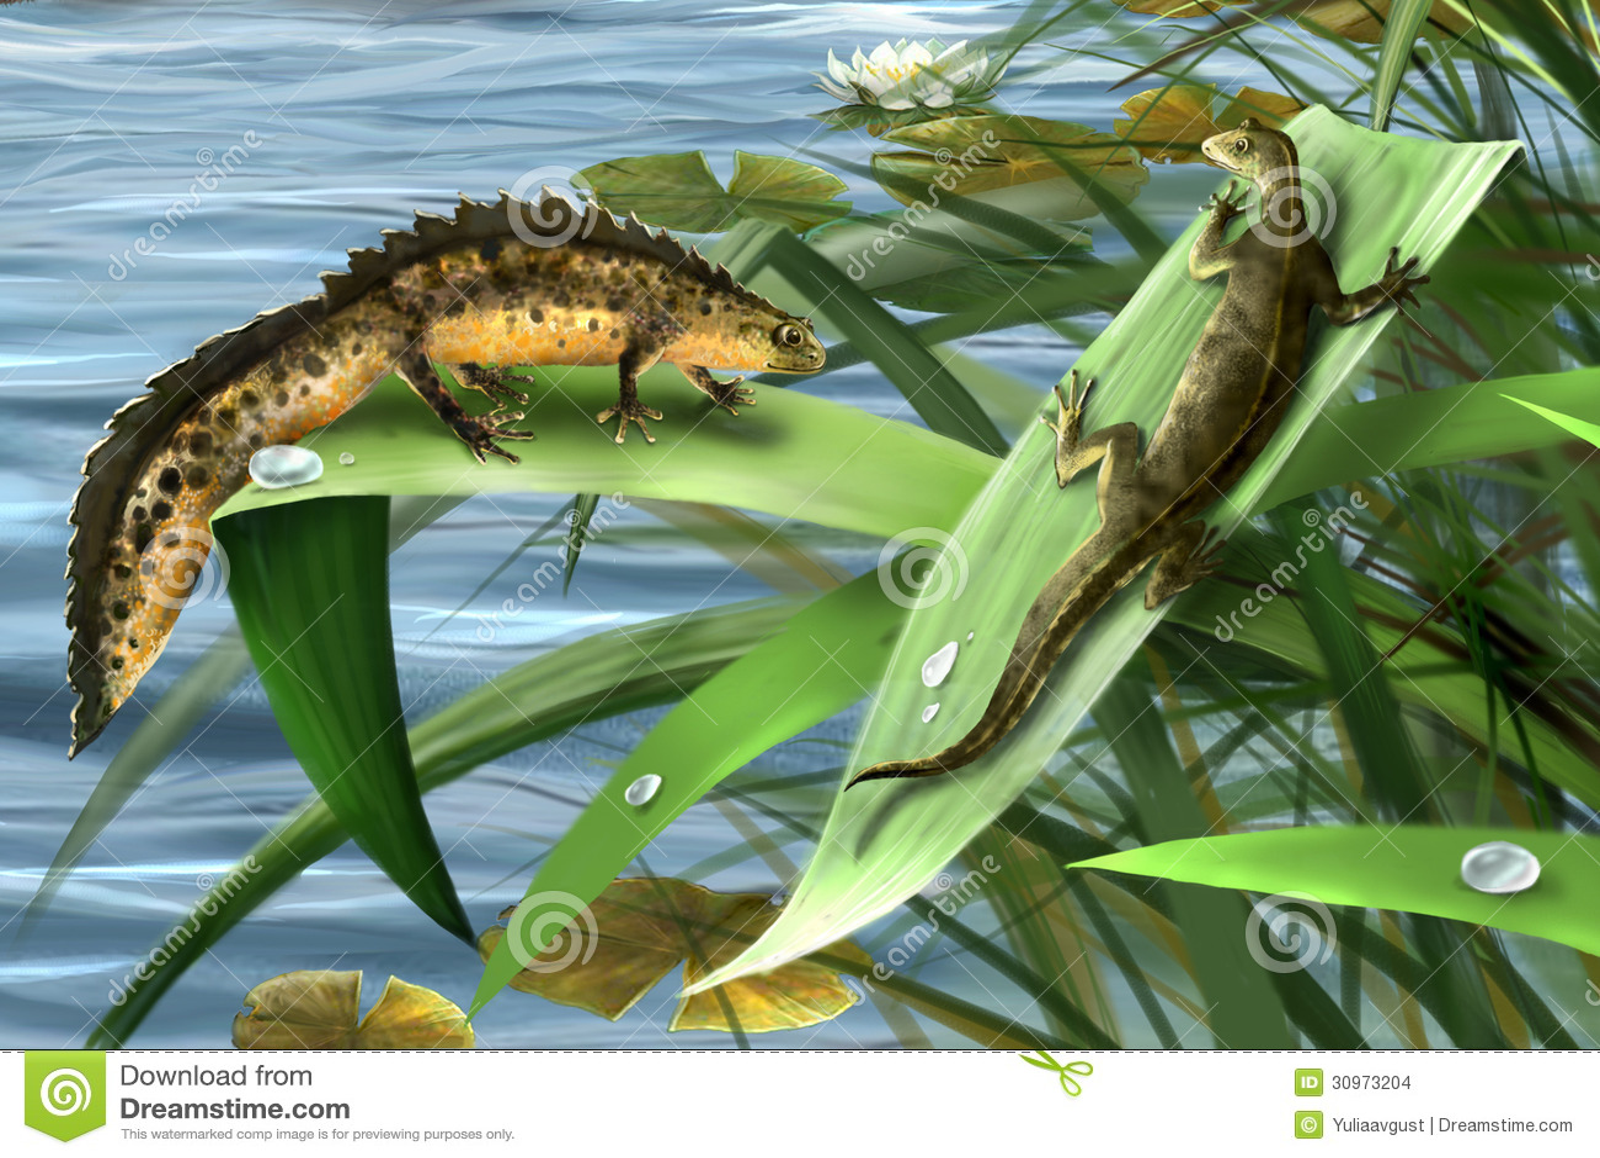 Newts family, newts love. amphibian salamander